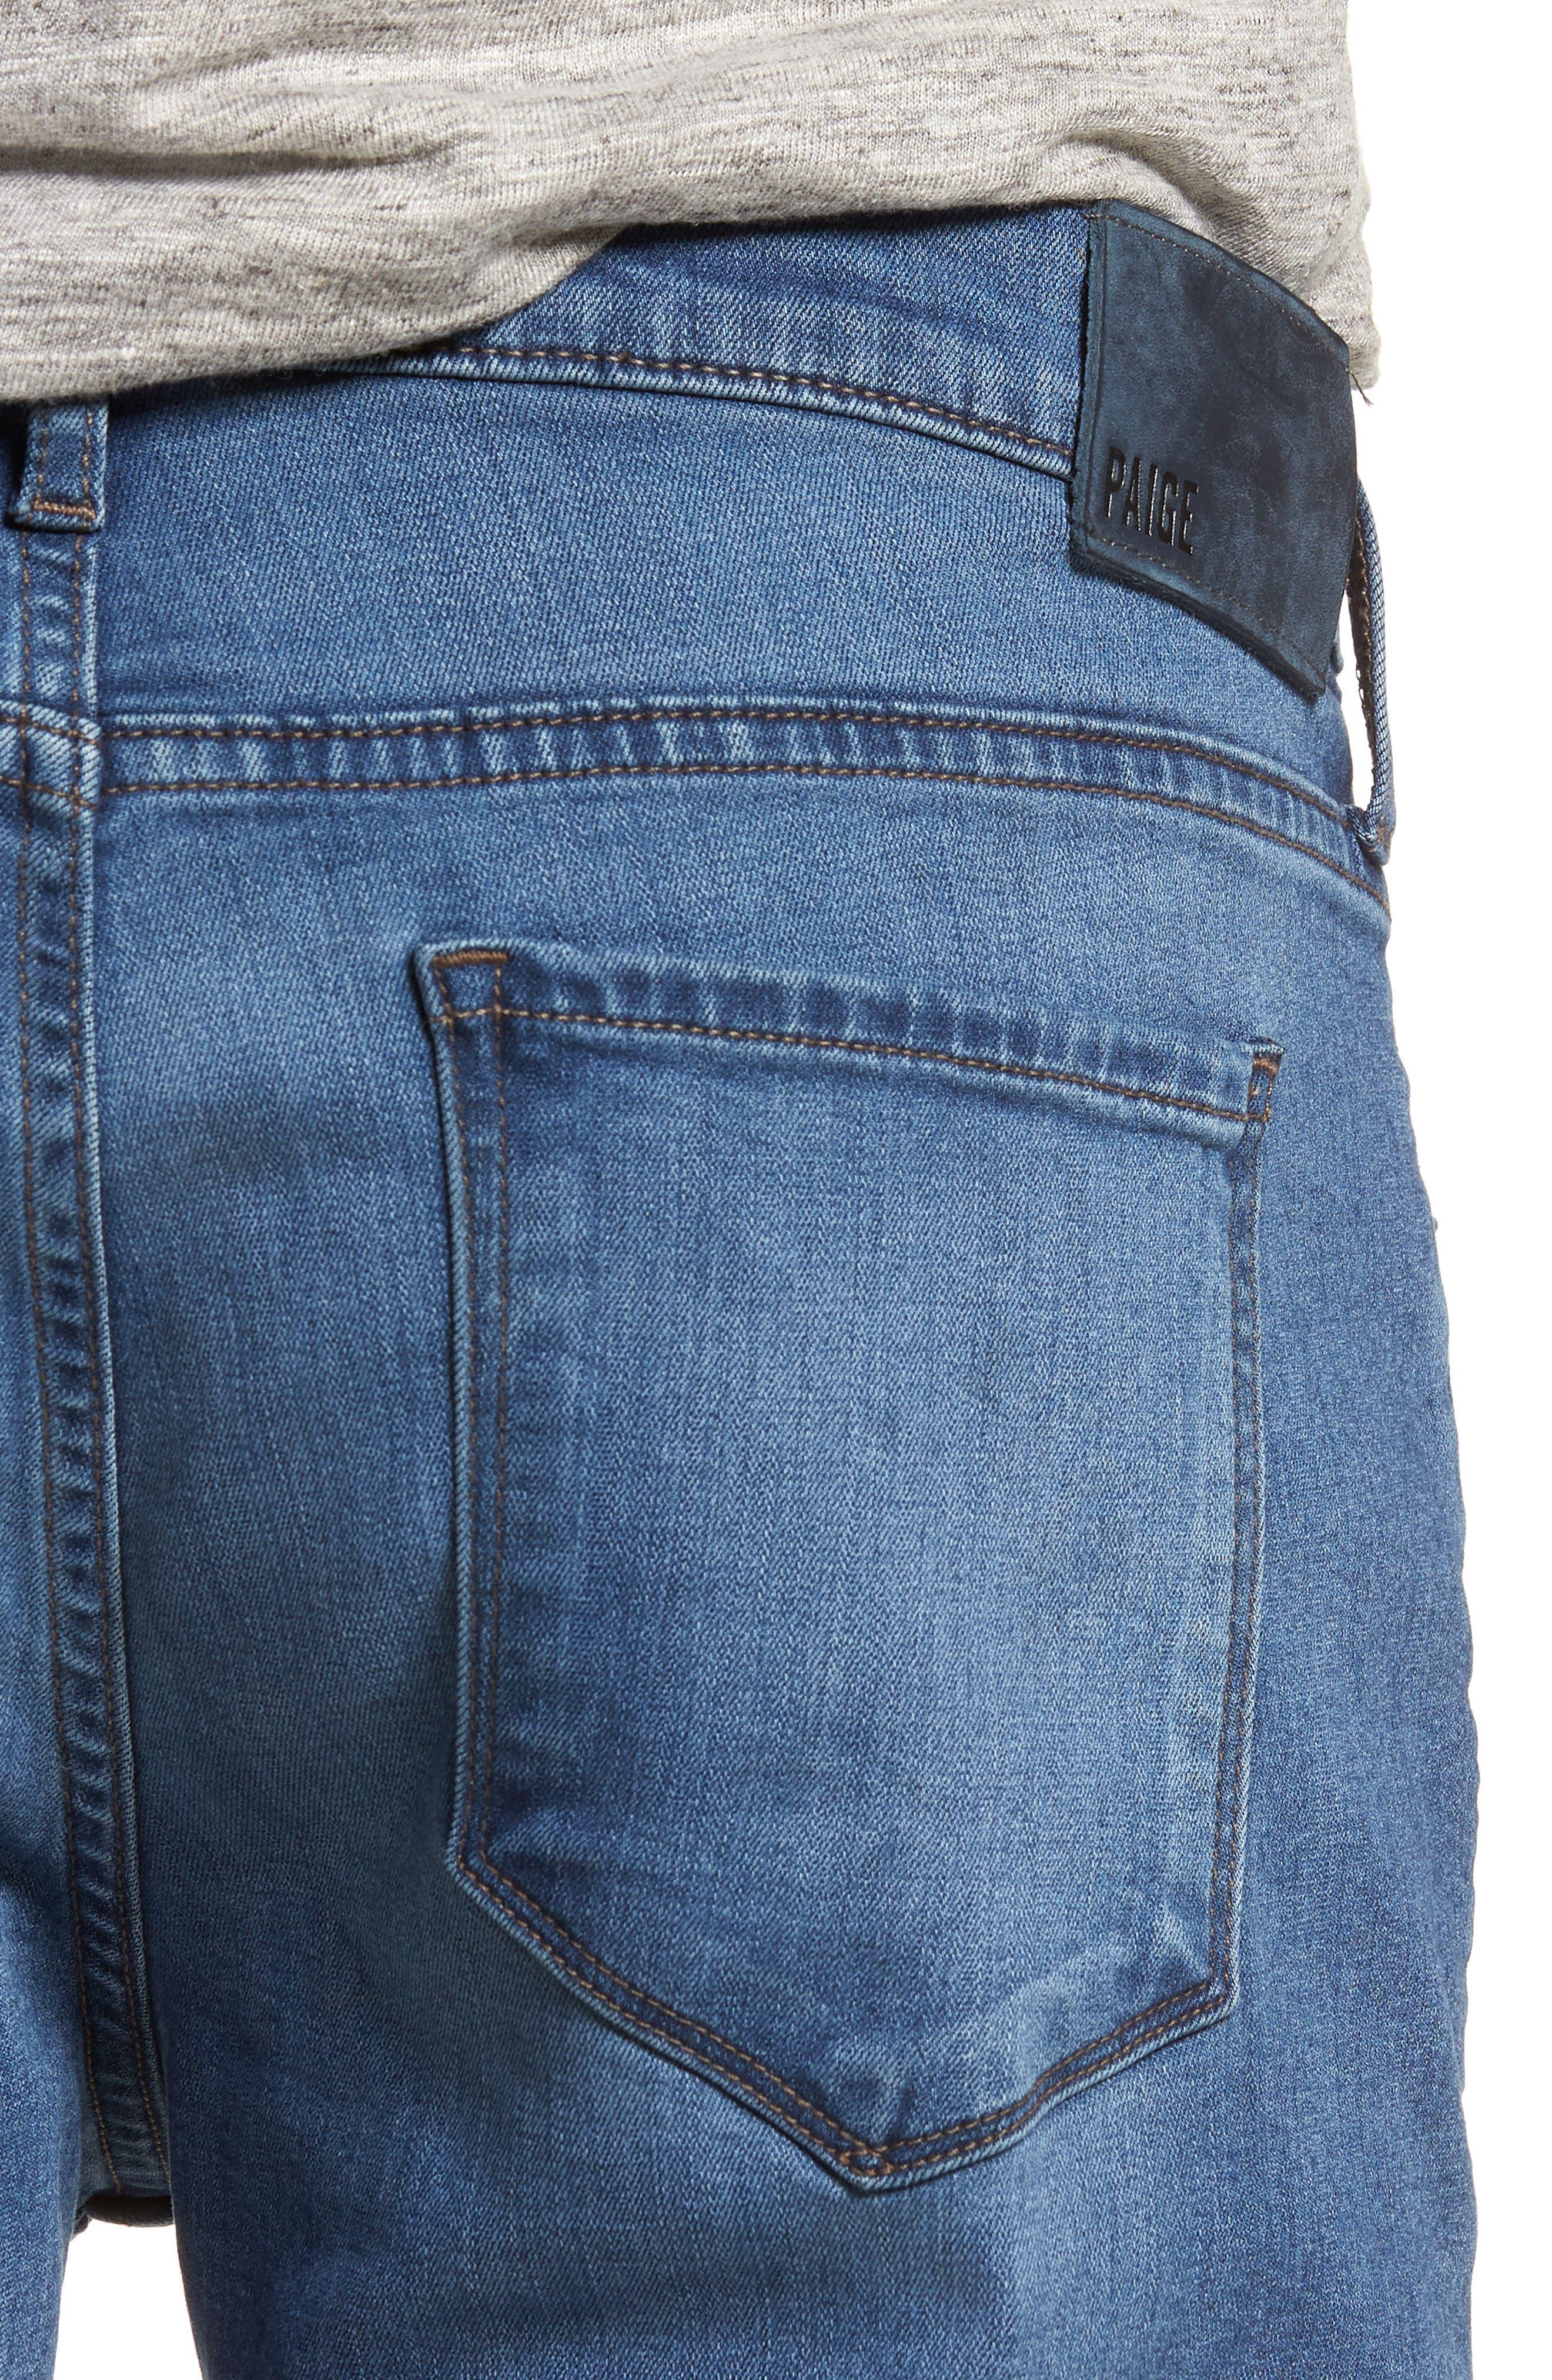 Federal Slim Straight Leg Jeans,                             Alternate thumbnail 4, color,                             400